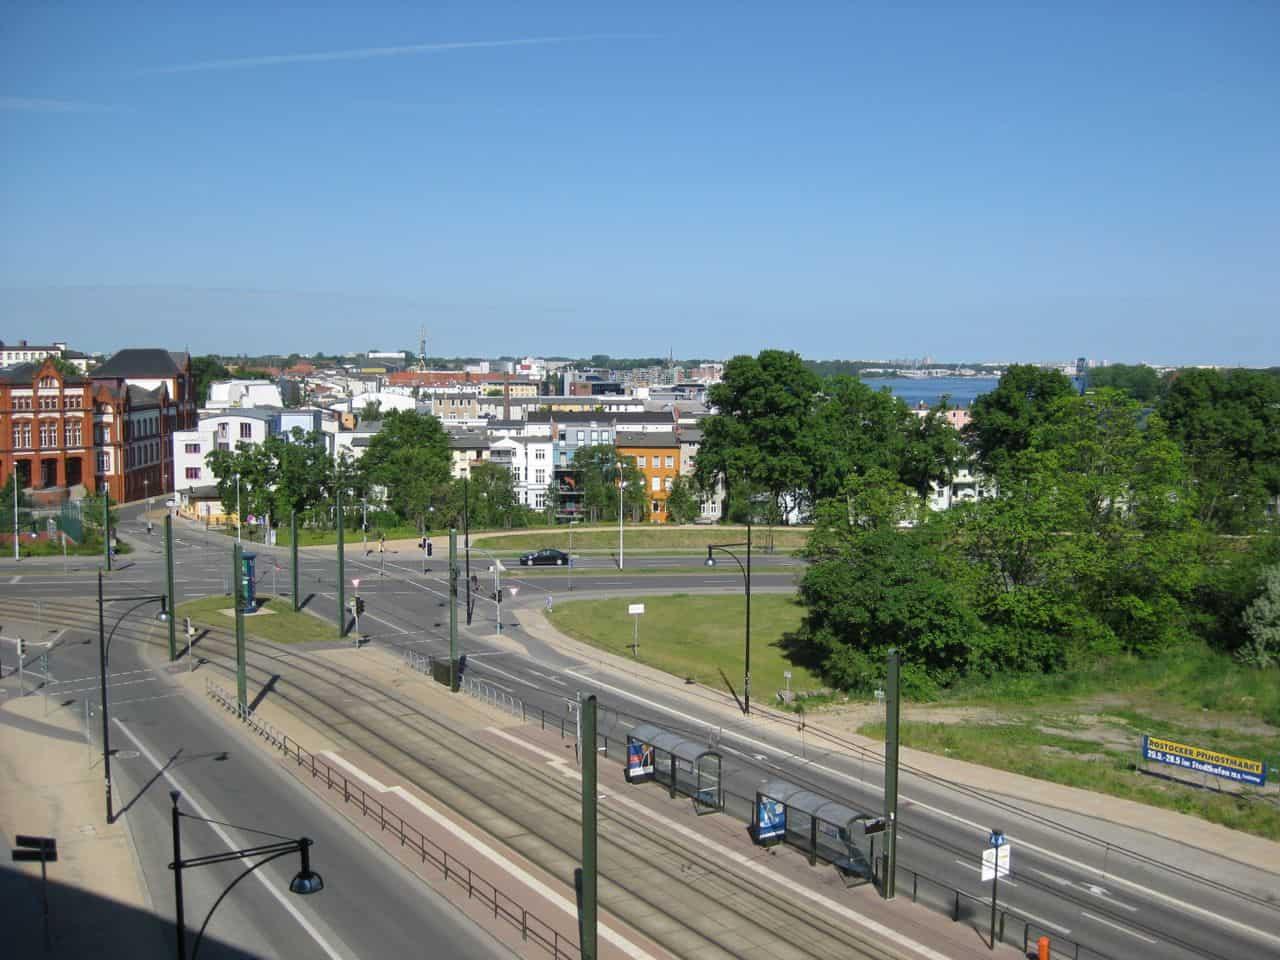 Radisson Blu Hotel - Rostock, Tyskland